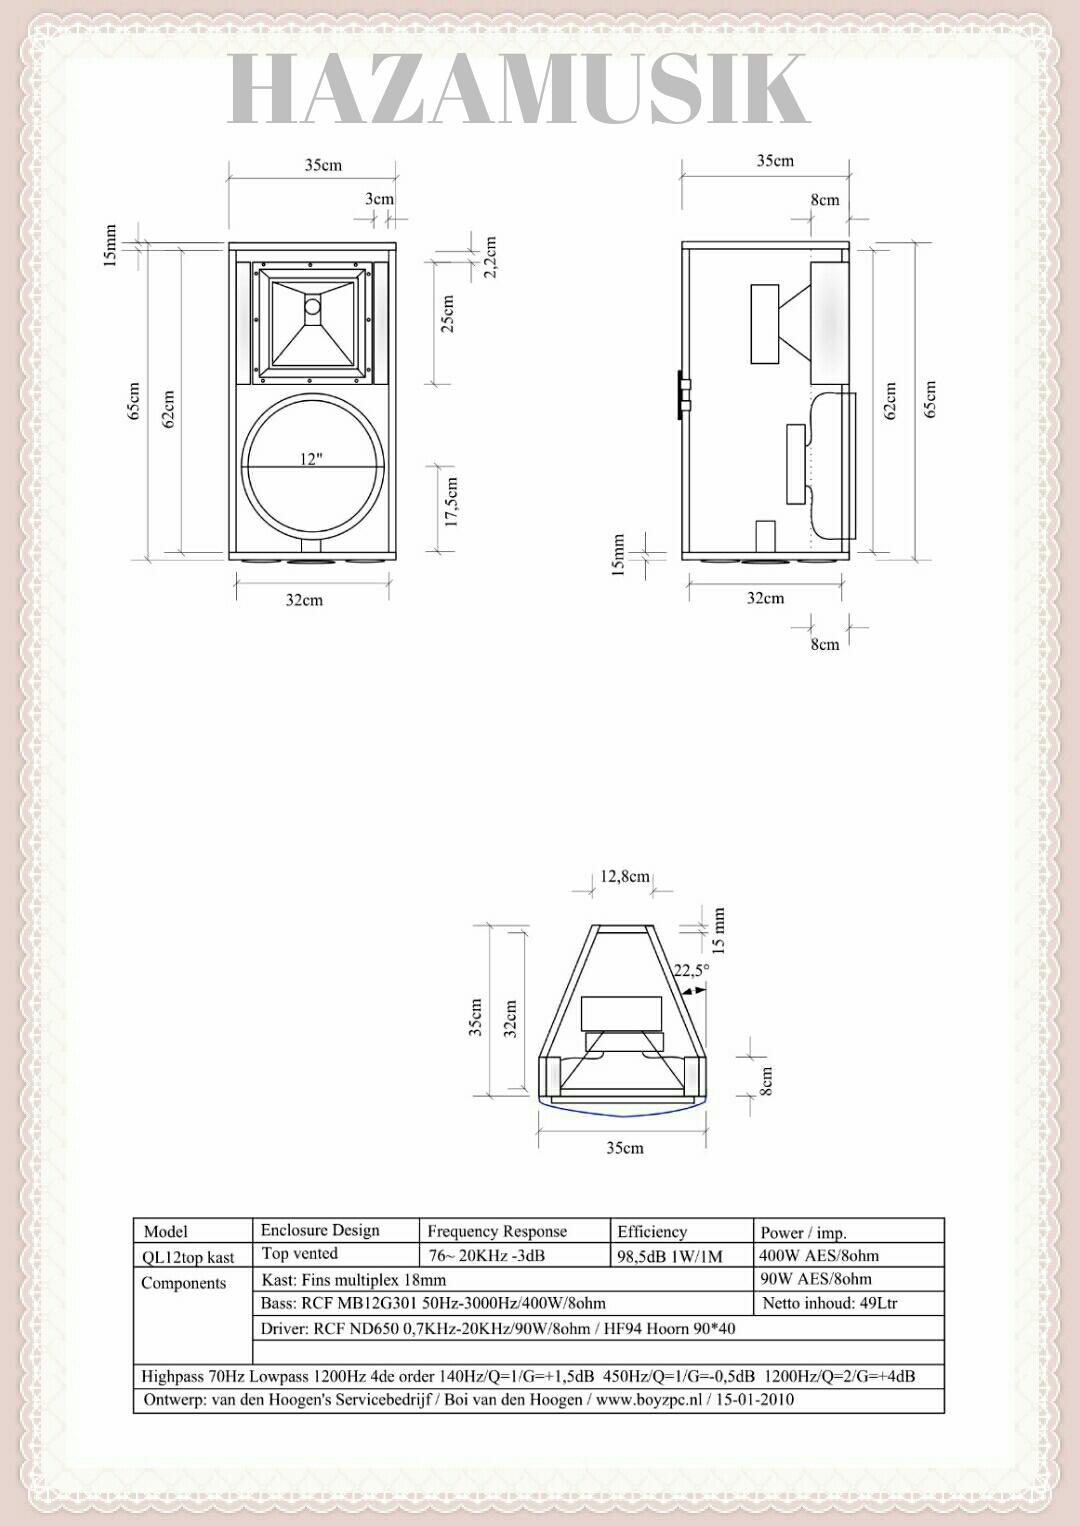 SKEMA BOX SPEAKER SUBWOOFER 18''X2 LAPANGAN SW7001 - HAZA MUSIK